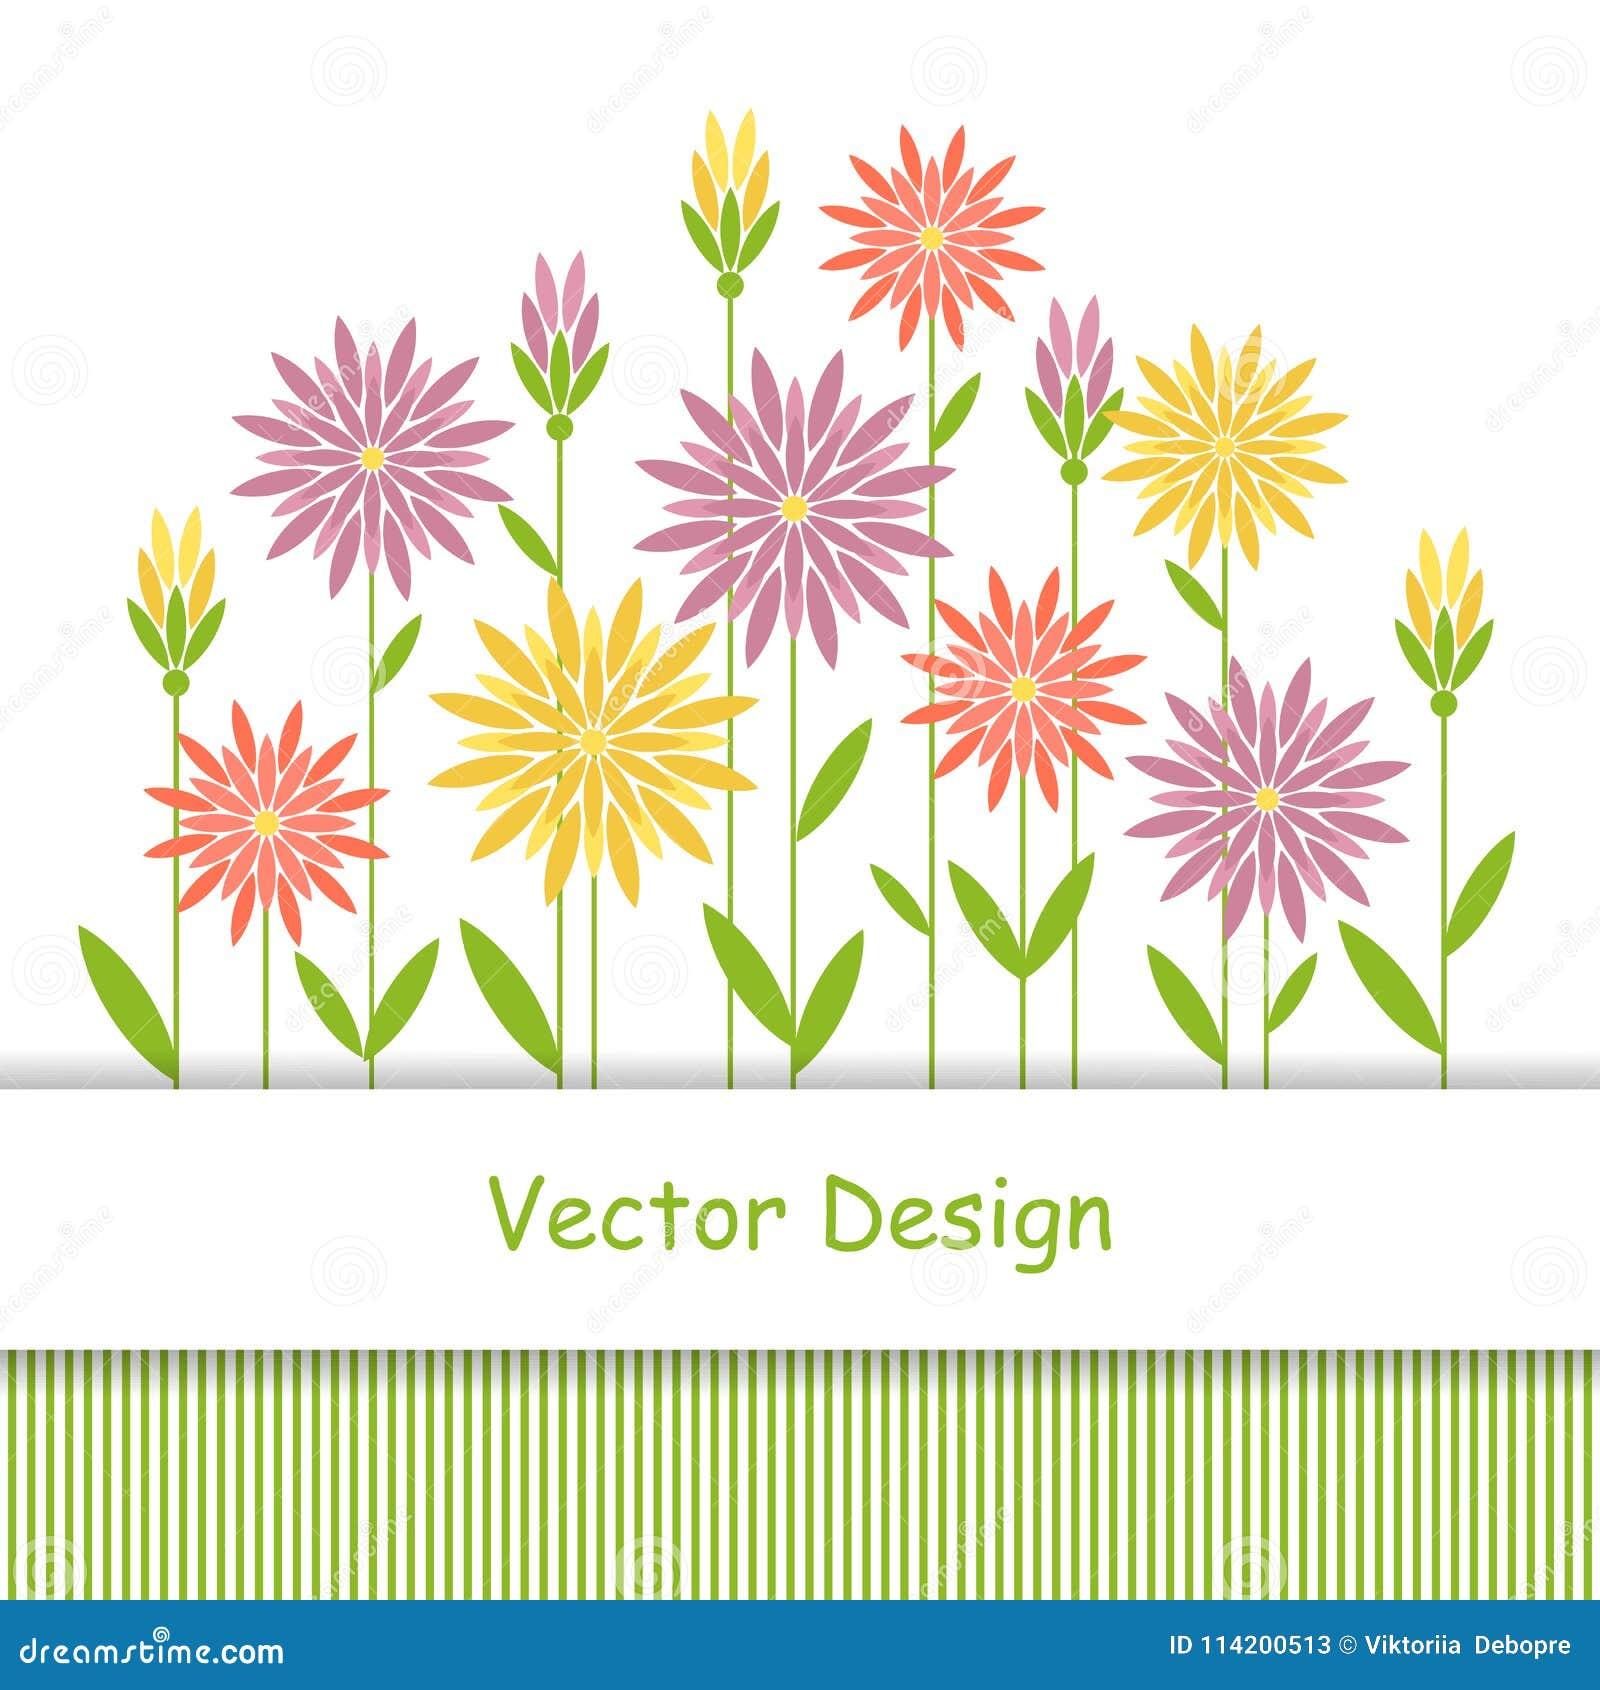 Simple Floral Background Stock Vector Illustration Of Modern